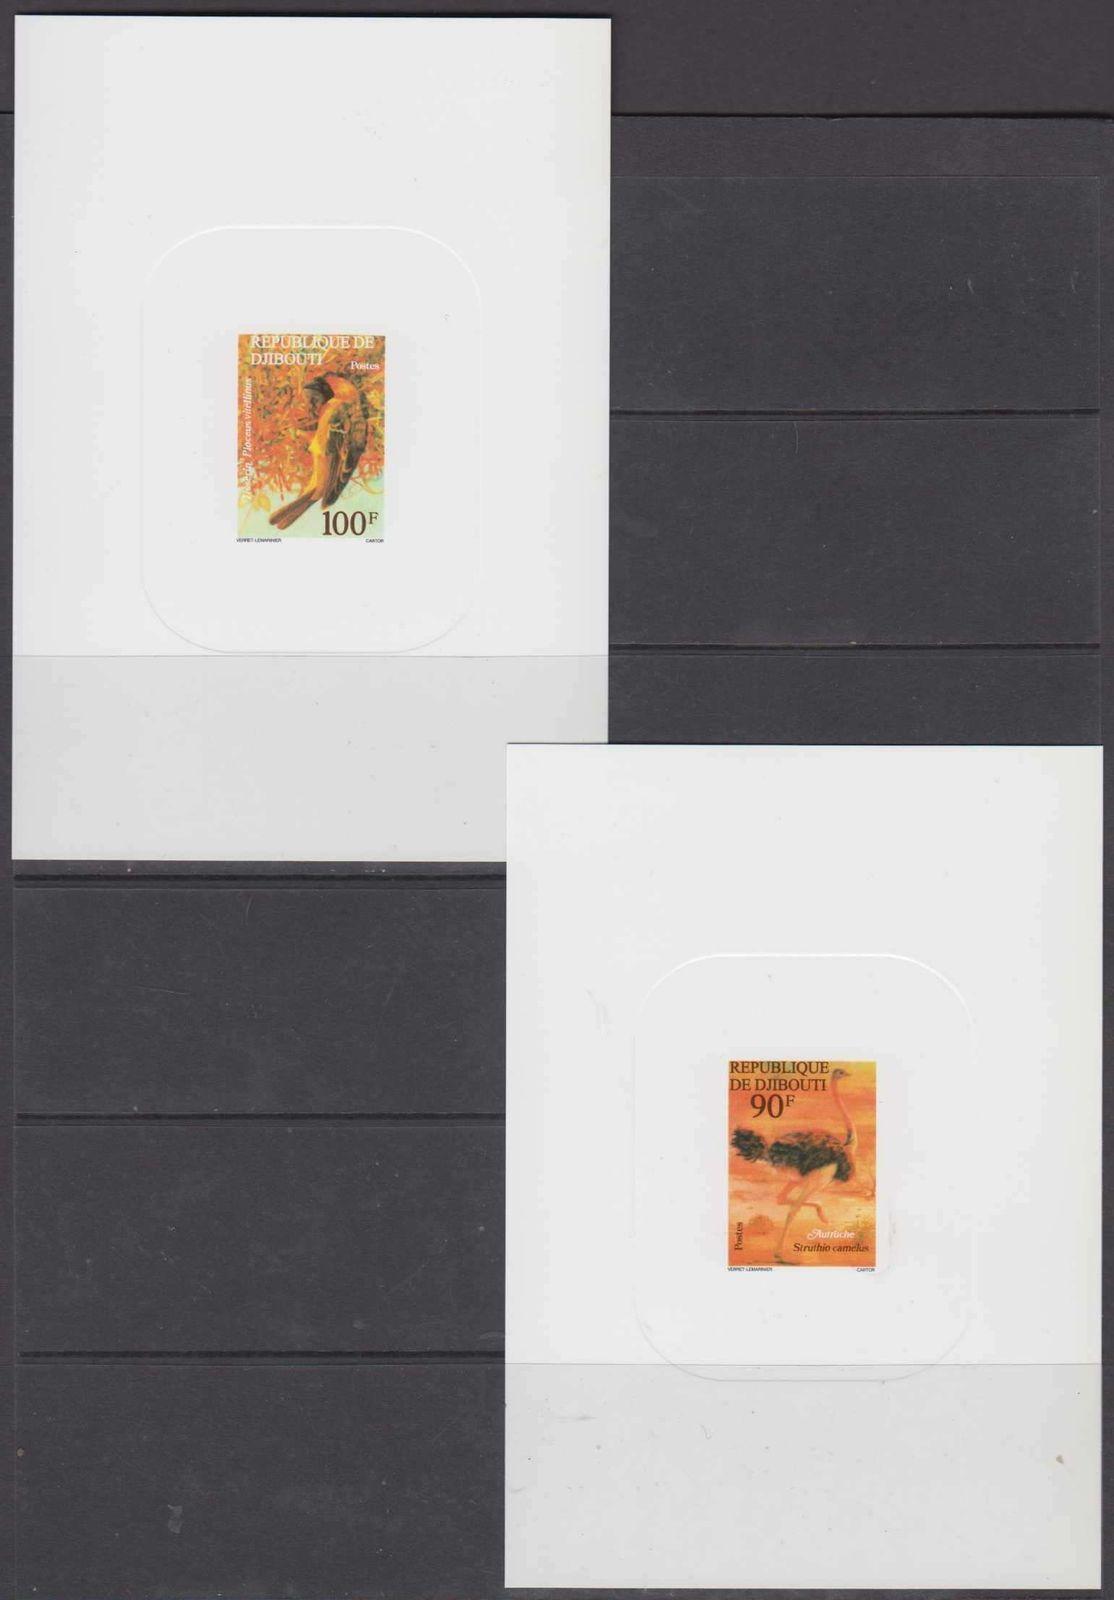 Briefmarken Z08 Imperf Djb16516d Djibouti 2016 Pigeons Mnh ** Postfrisch Dschibuti